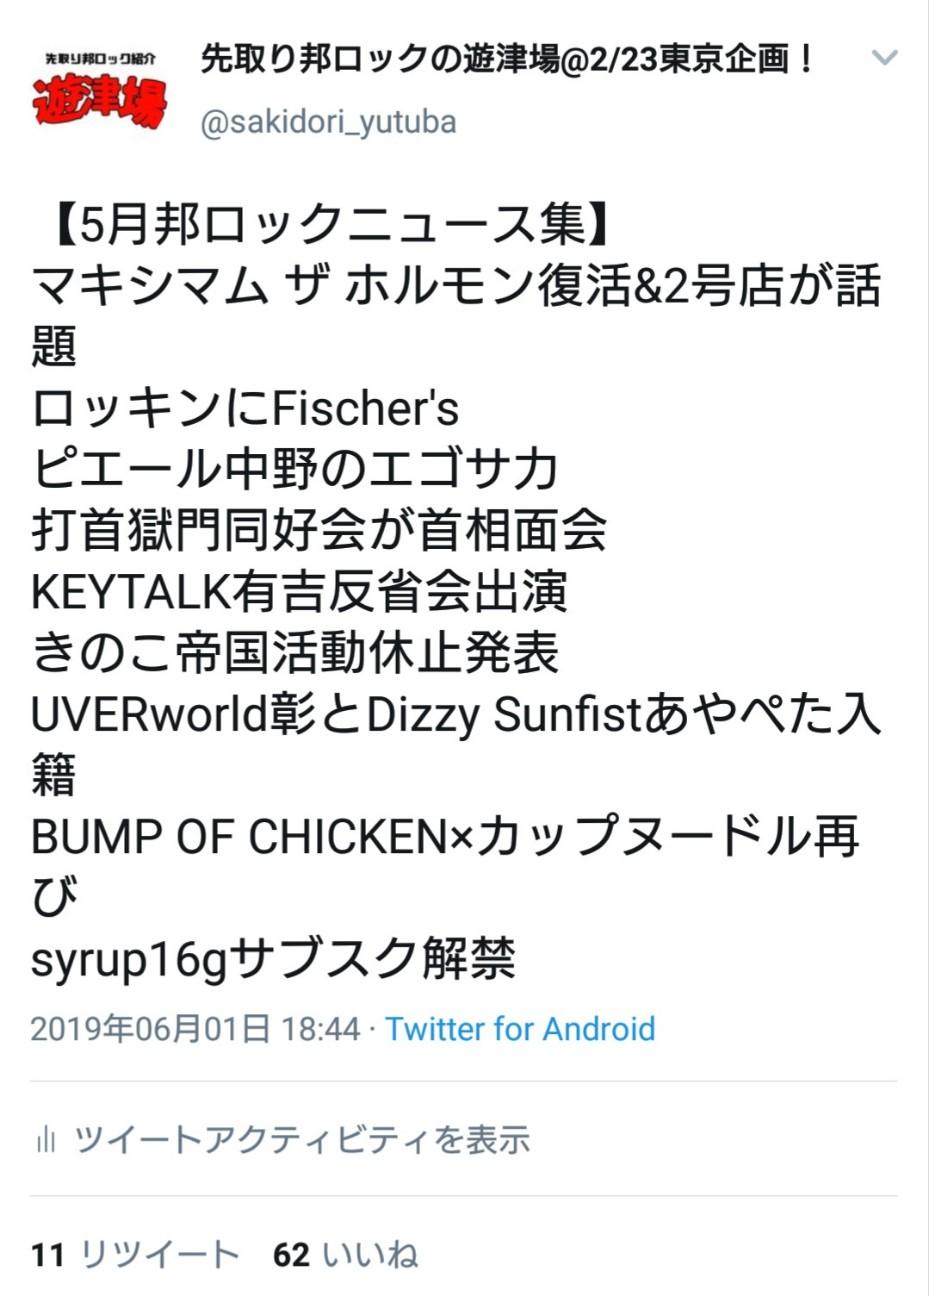 f:id:sakidoriyutsubarock:20191218010215j:plain